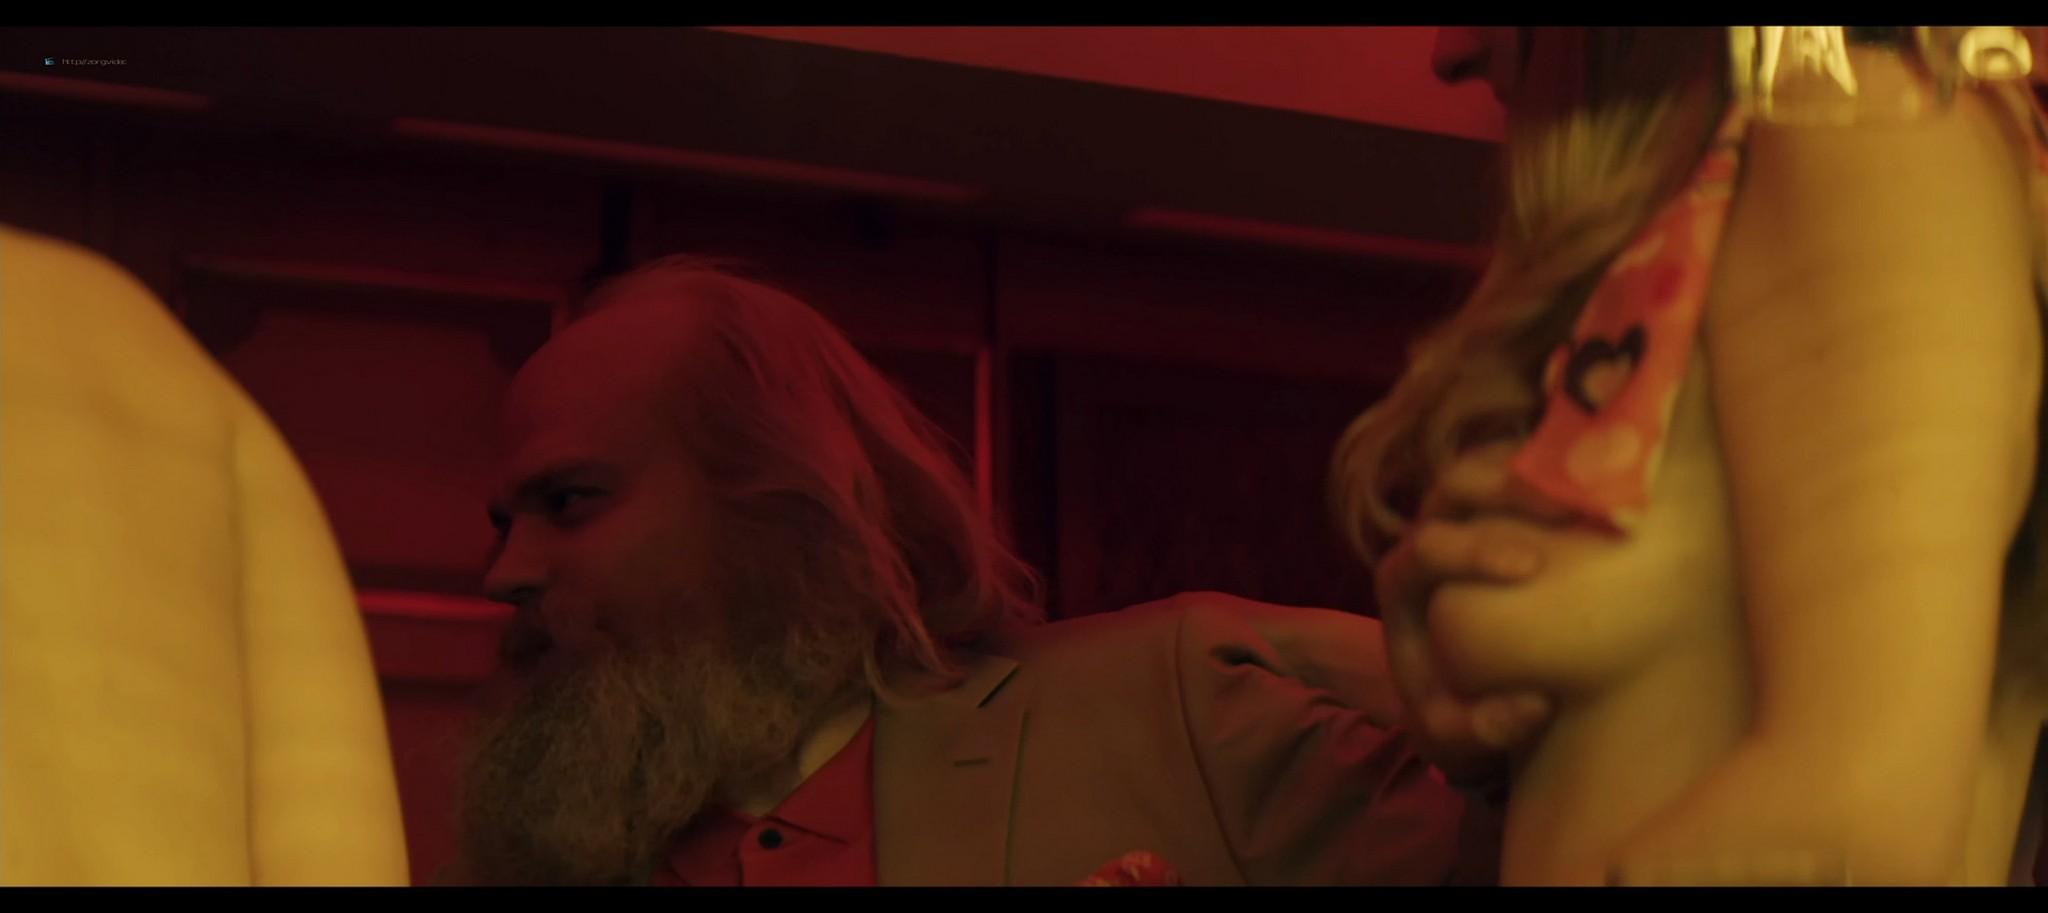 Camilla Cornelia Lehmann nude Sarahsita Lassen, nude and explicit body parts - Spies Og Glistrup (DK-2013) HD 1080p BluRay (4)